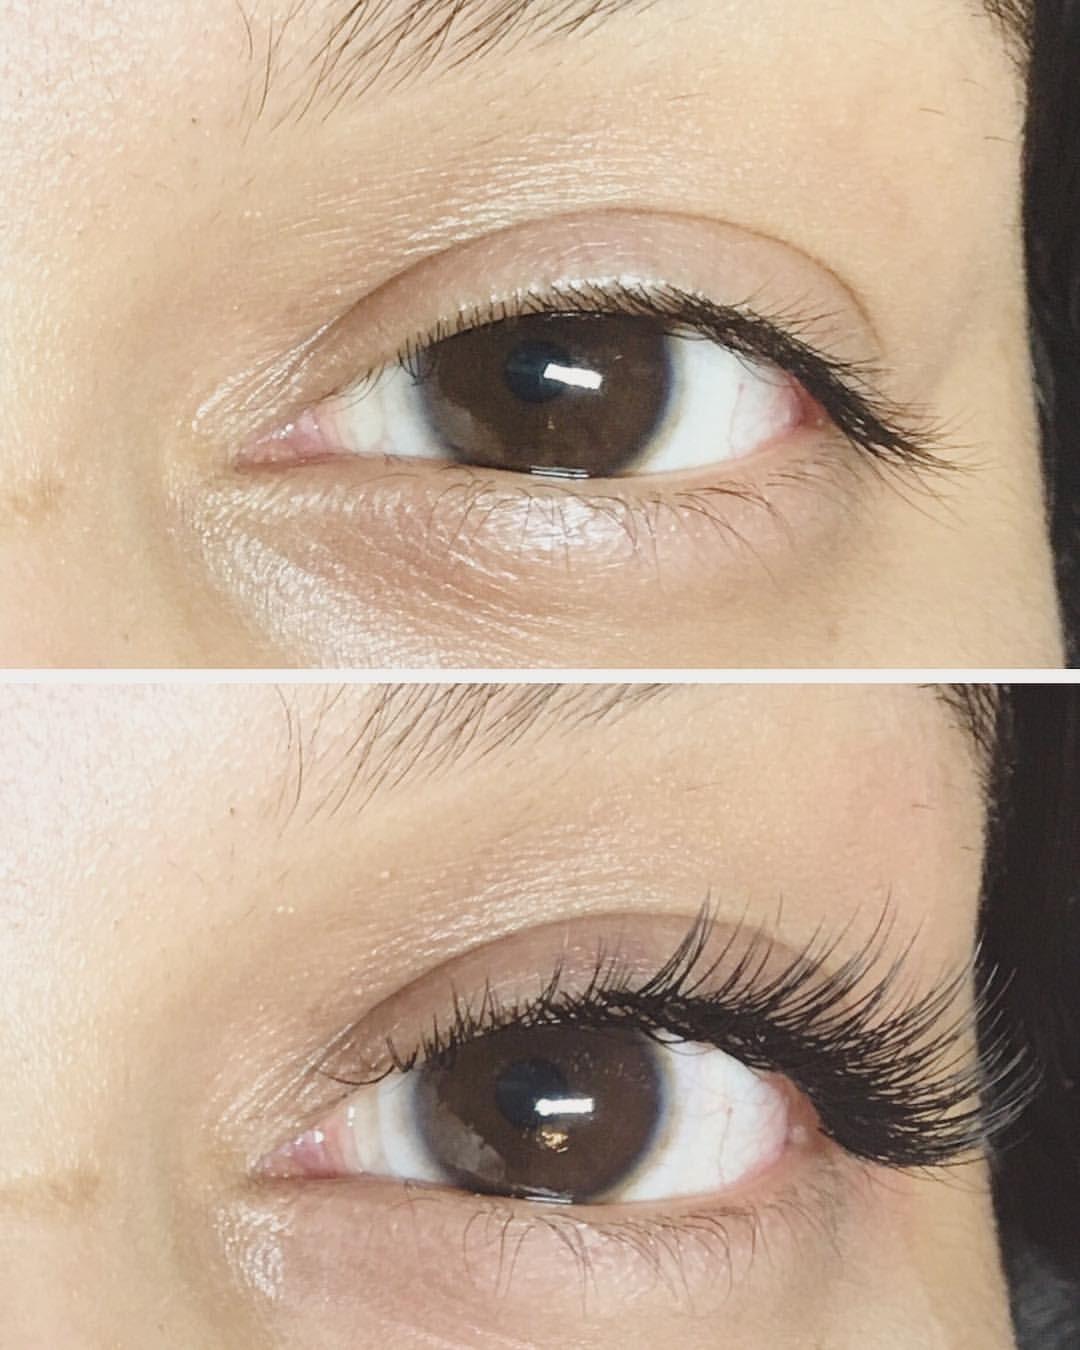 0bb5b569bba eyelashextensionsatlanta eyelash extensions, volume lashes, lashes, lash  extensions, Atlanta, lash artist, lash stylist, classic lashes, wake up in  makeup, ...